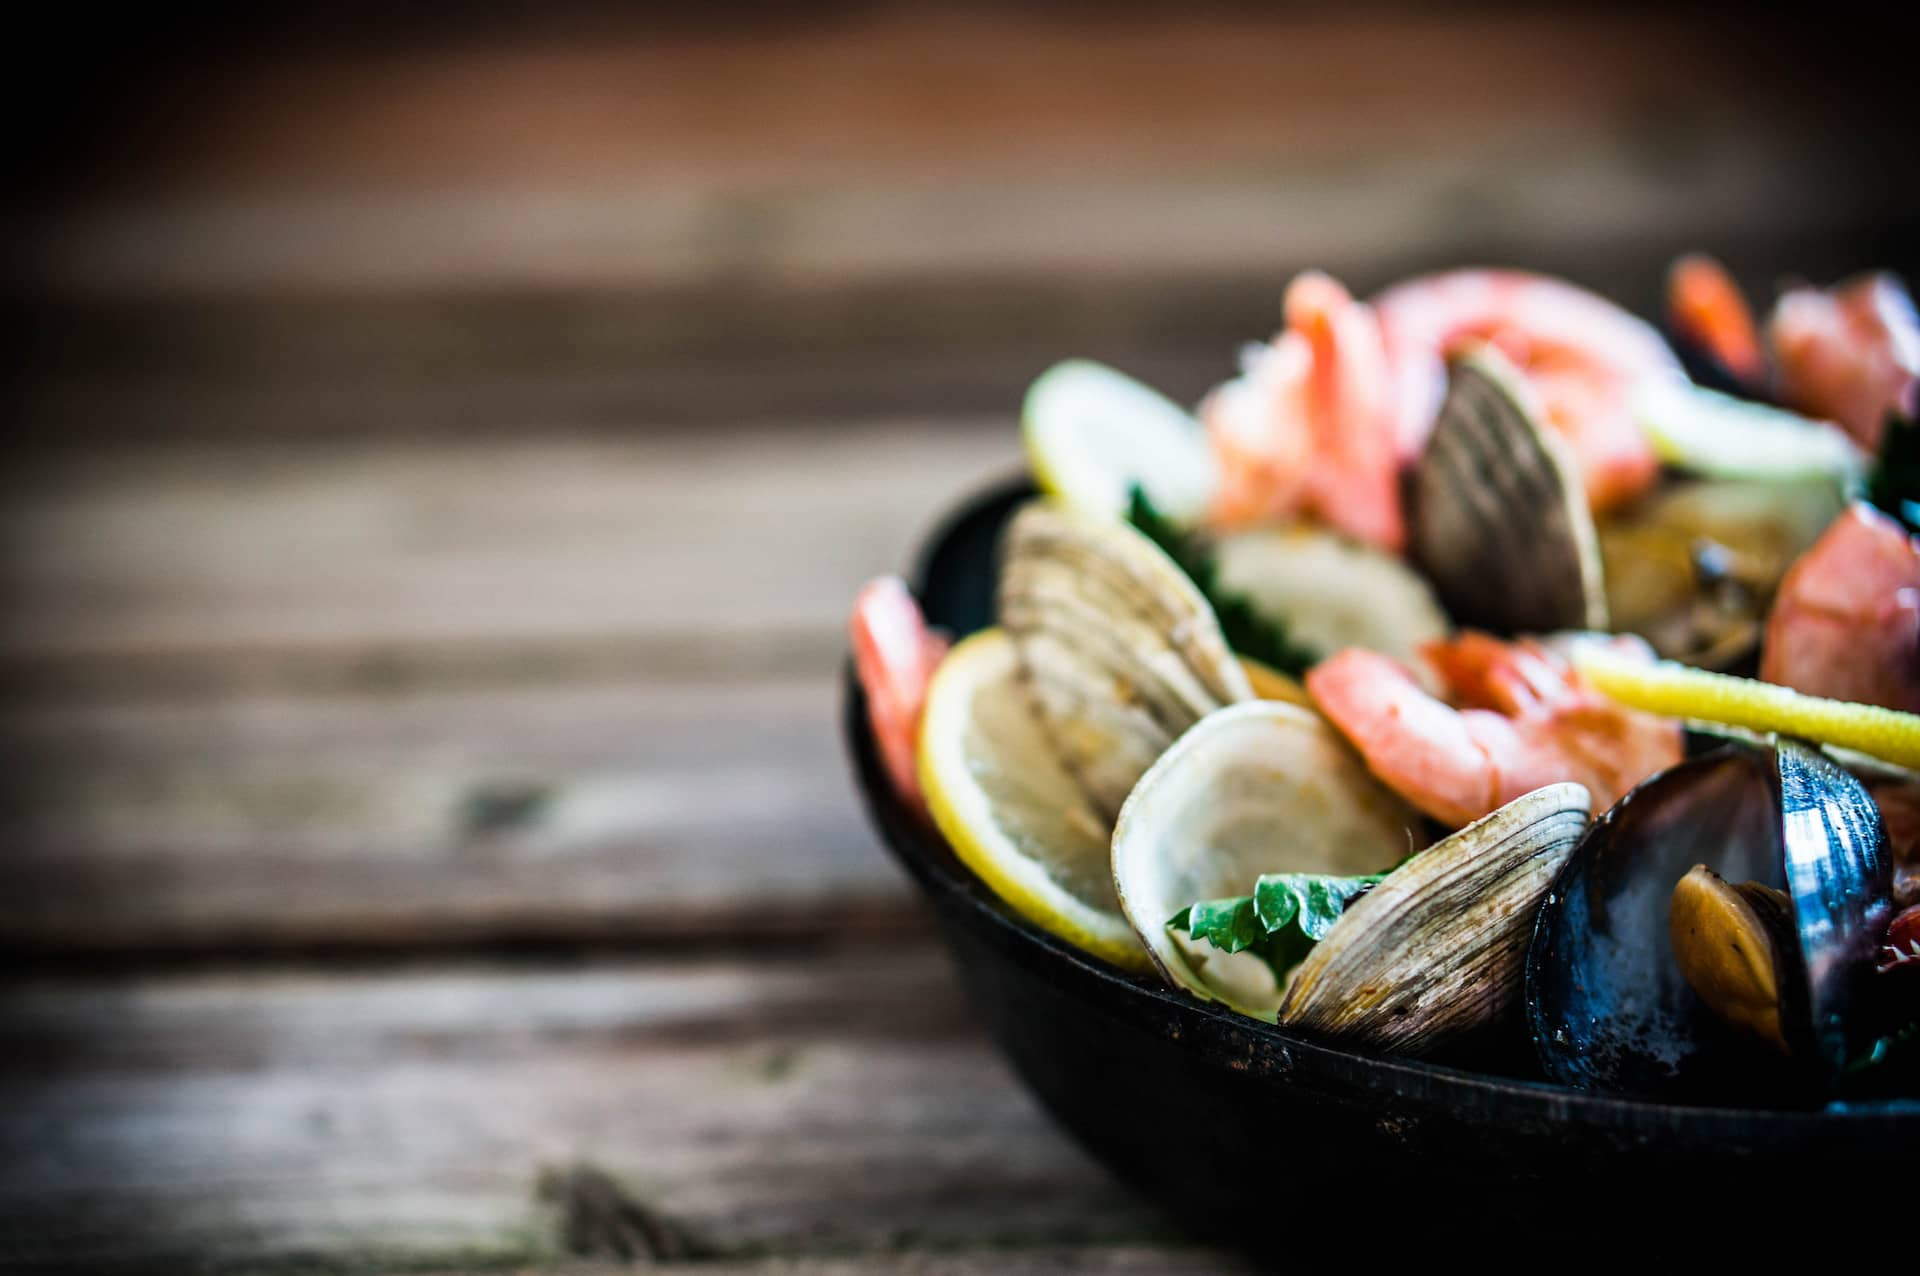 Coquillages & Crustacés